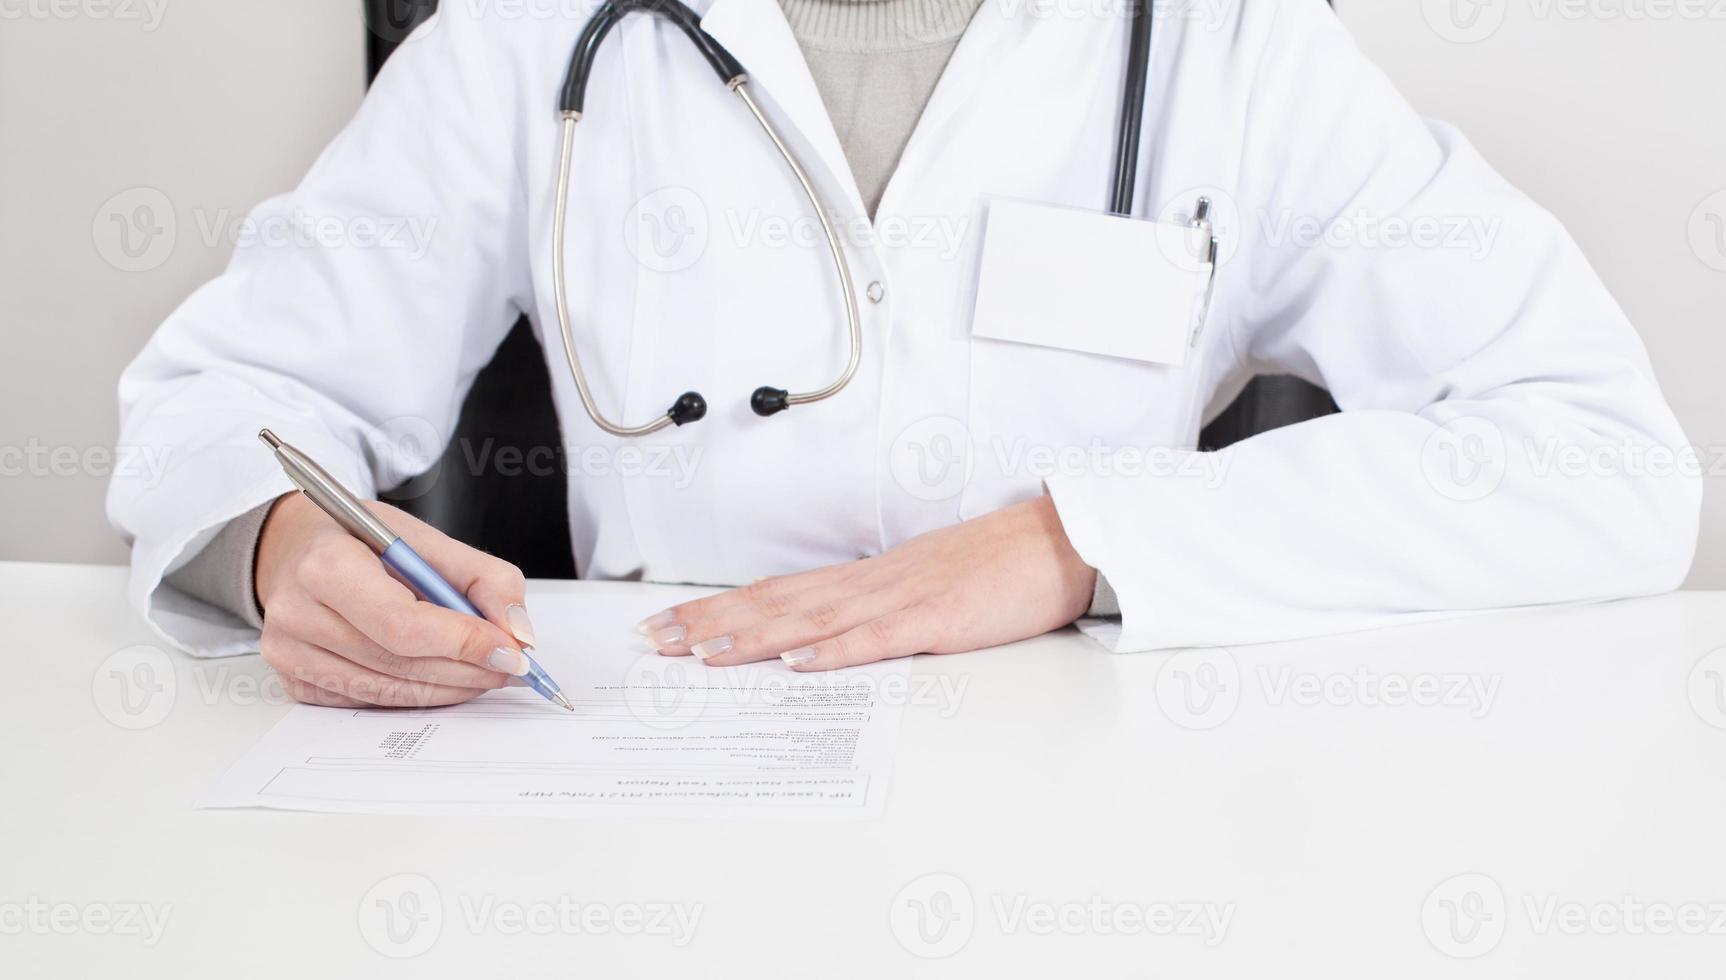 läkare skriver recept foto